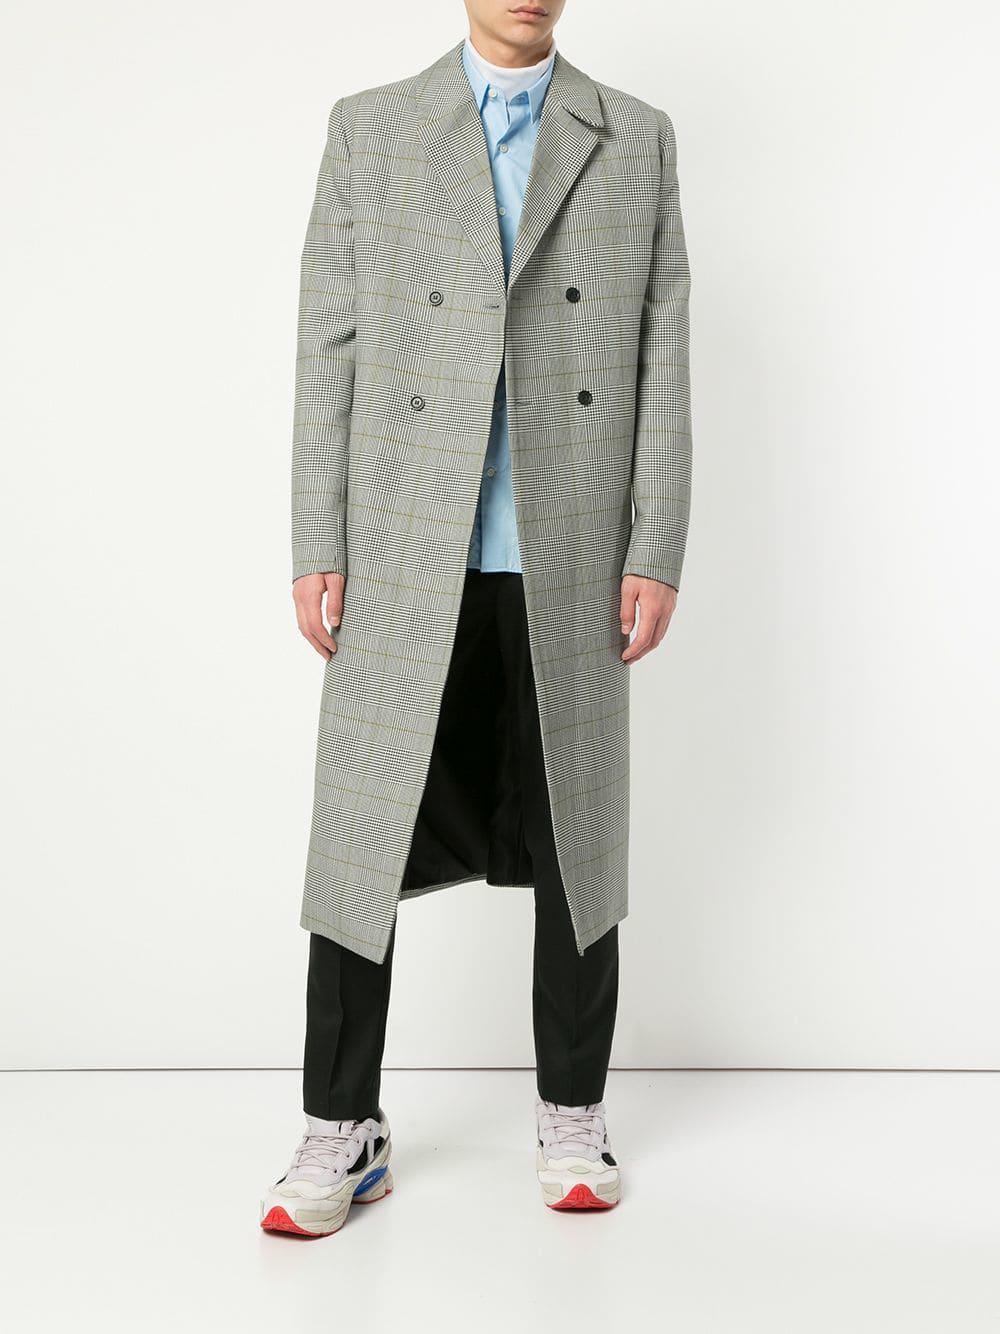 41a45f385267 Strateas Carlucci - Gray Meta Coat for Men - Lyst. View fullscreen